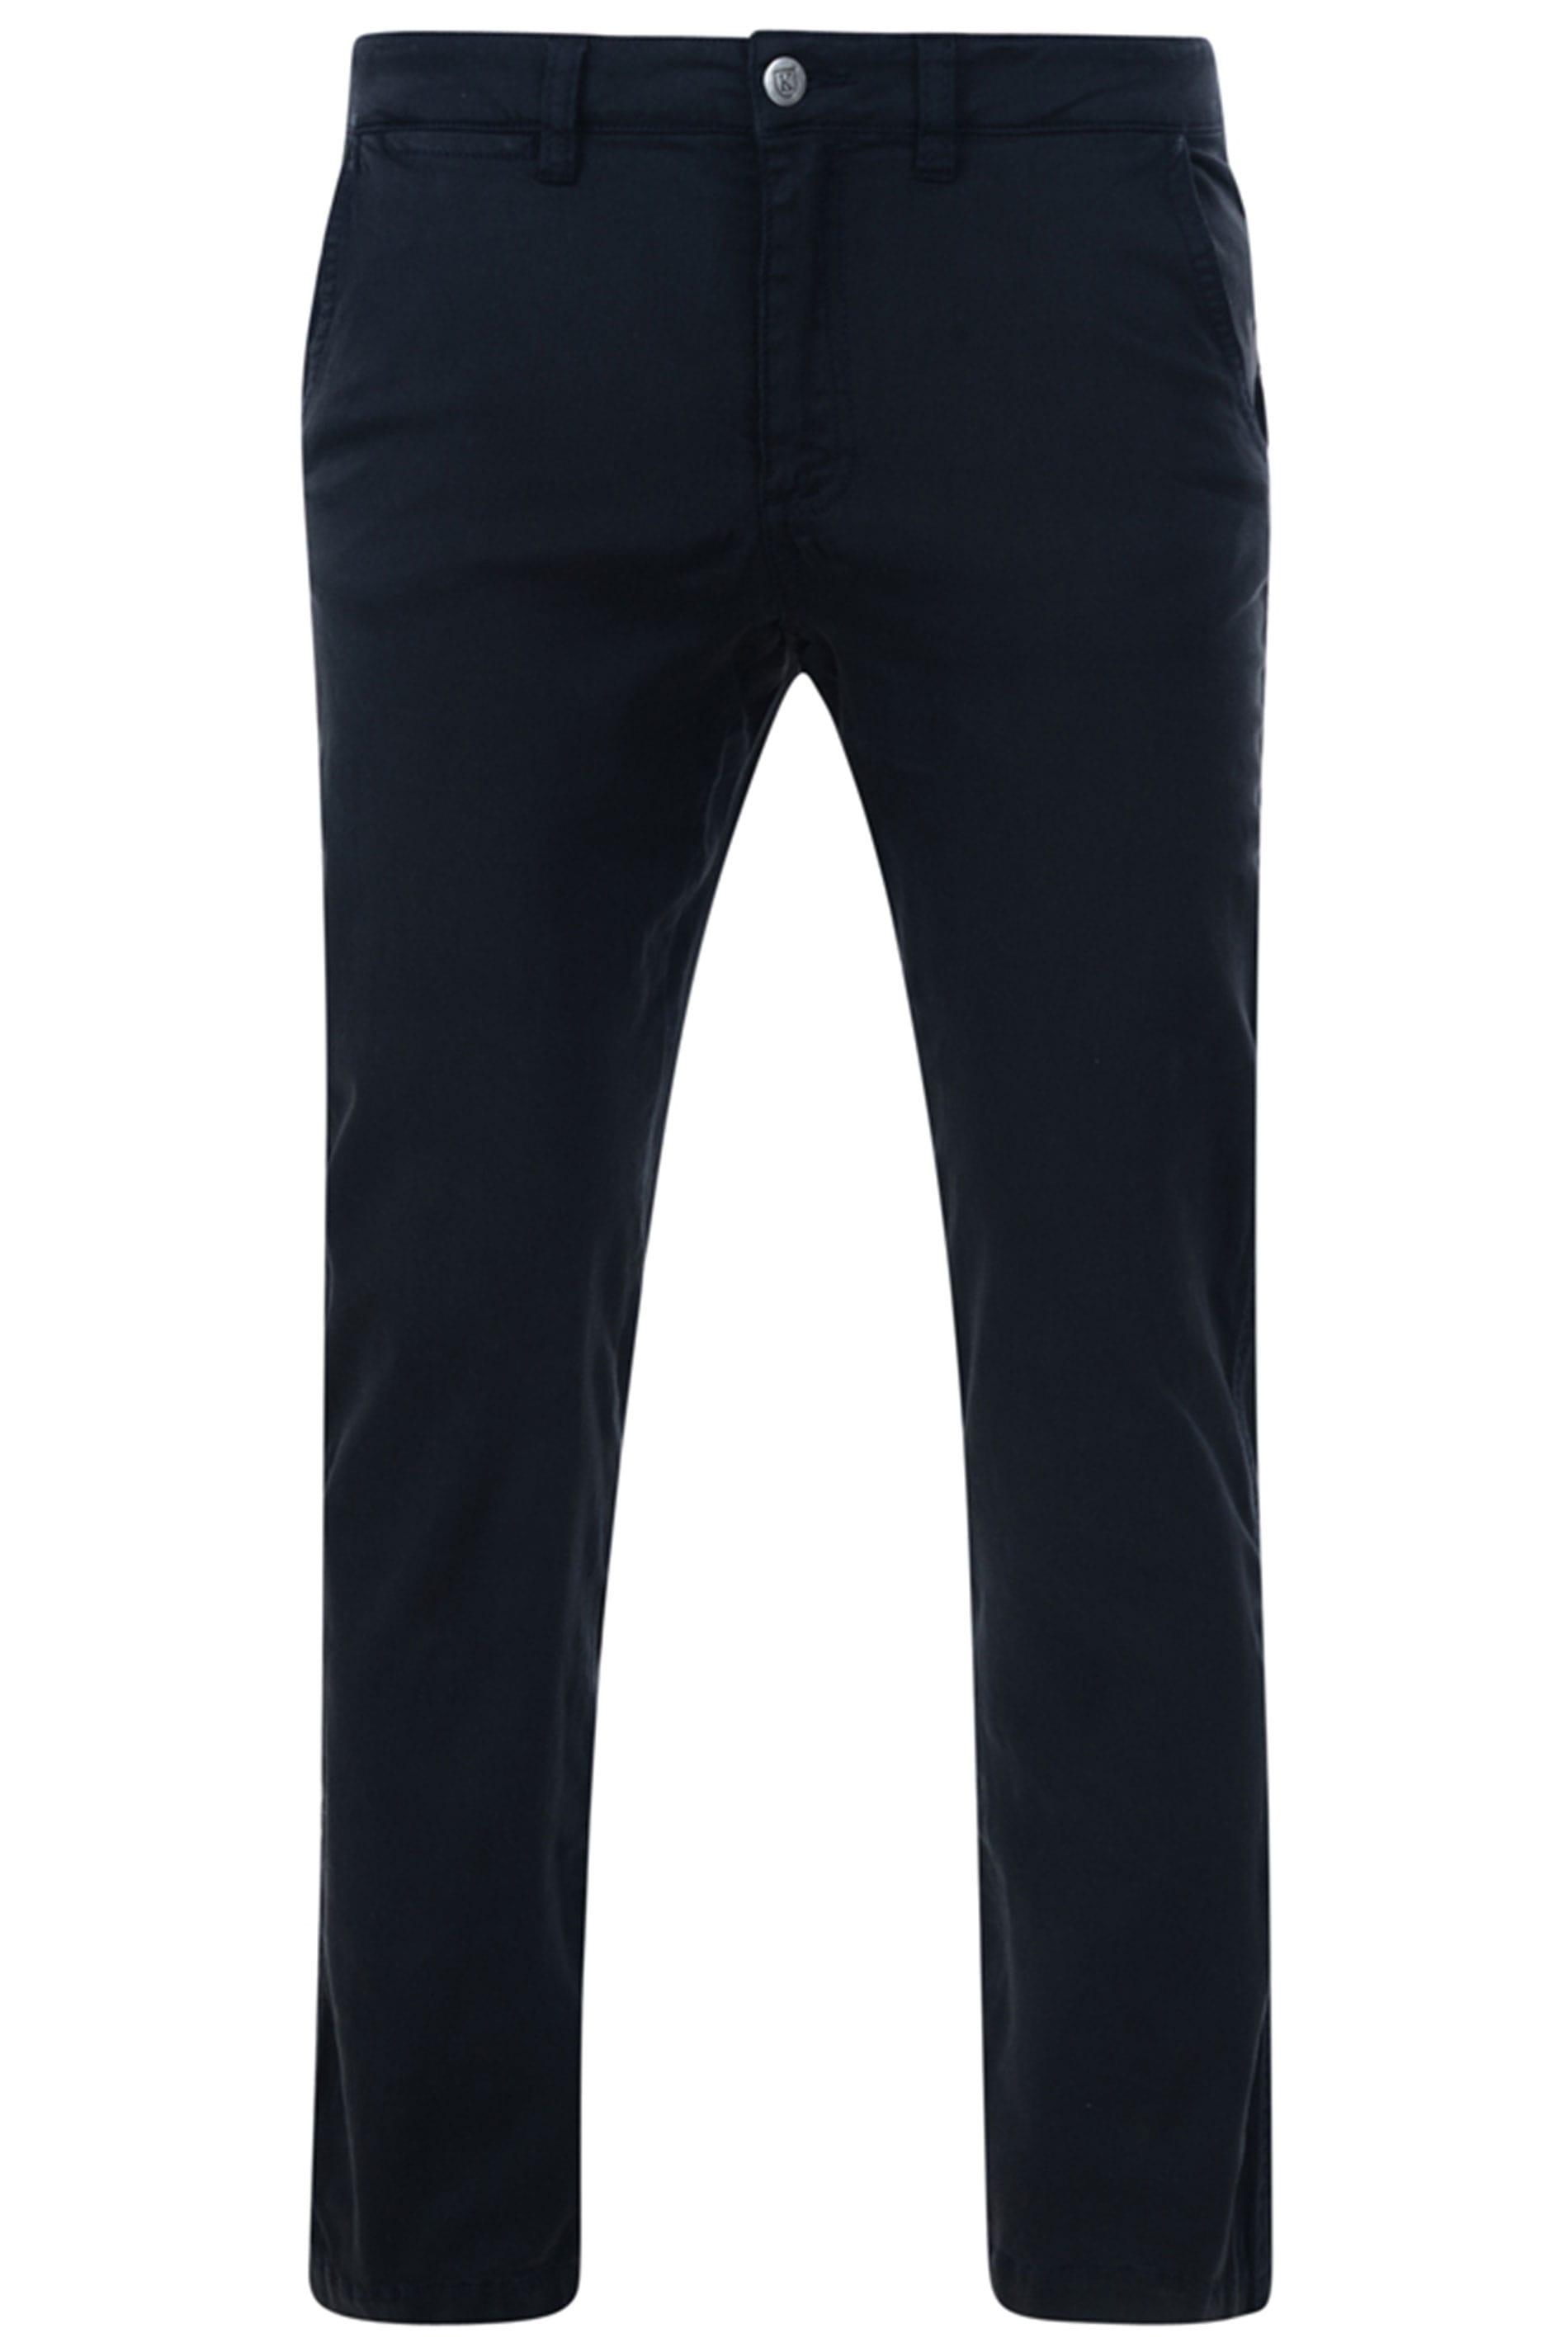 KAM Navy Chino Trousers_a83a.jpg